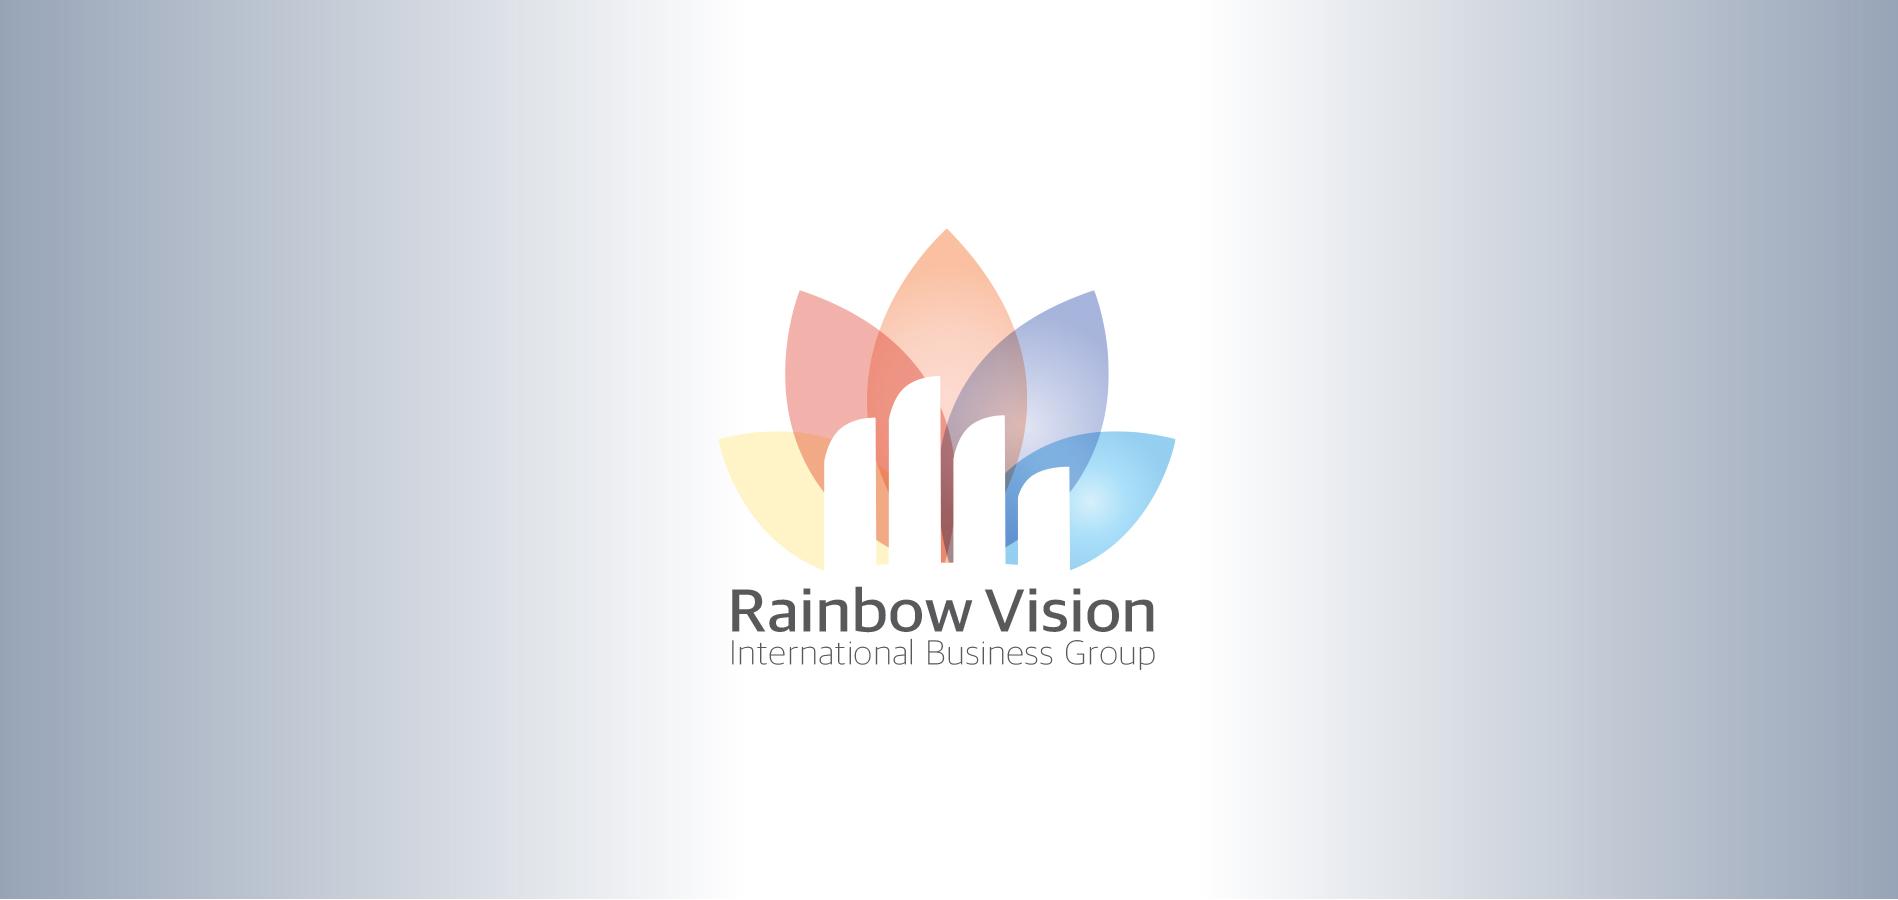 Rainbow Vision logo